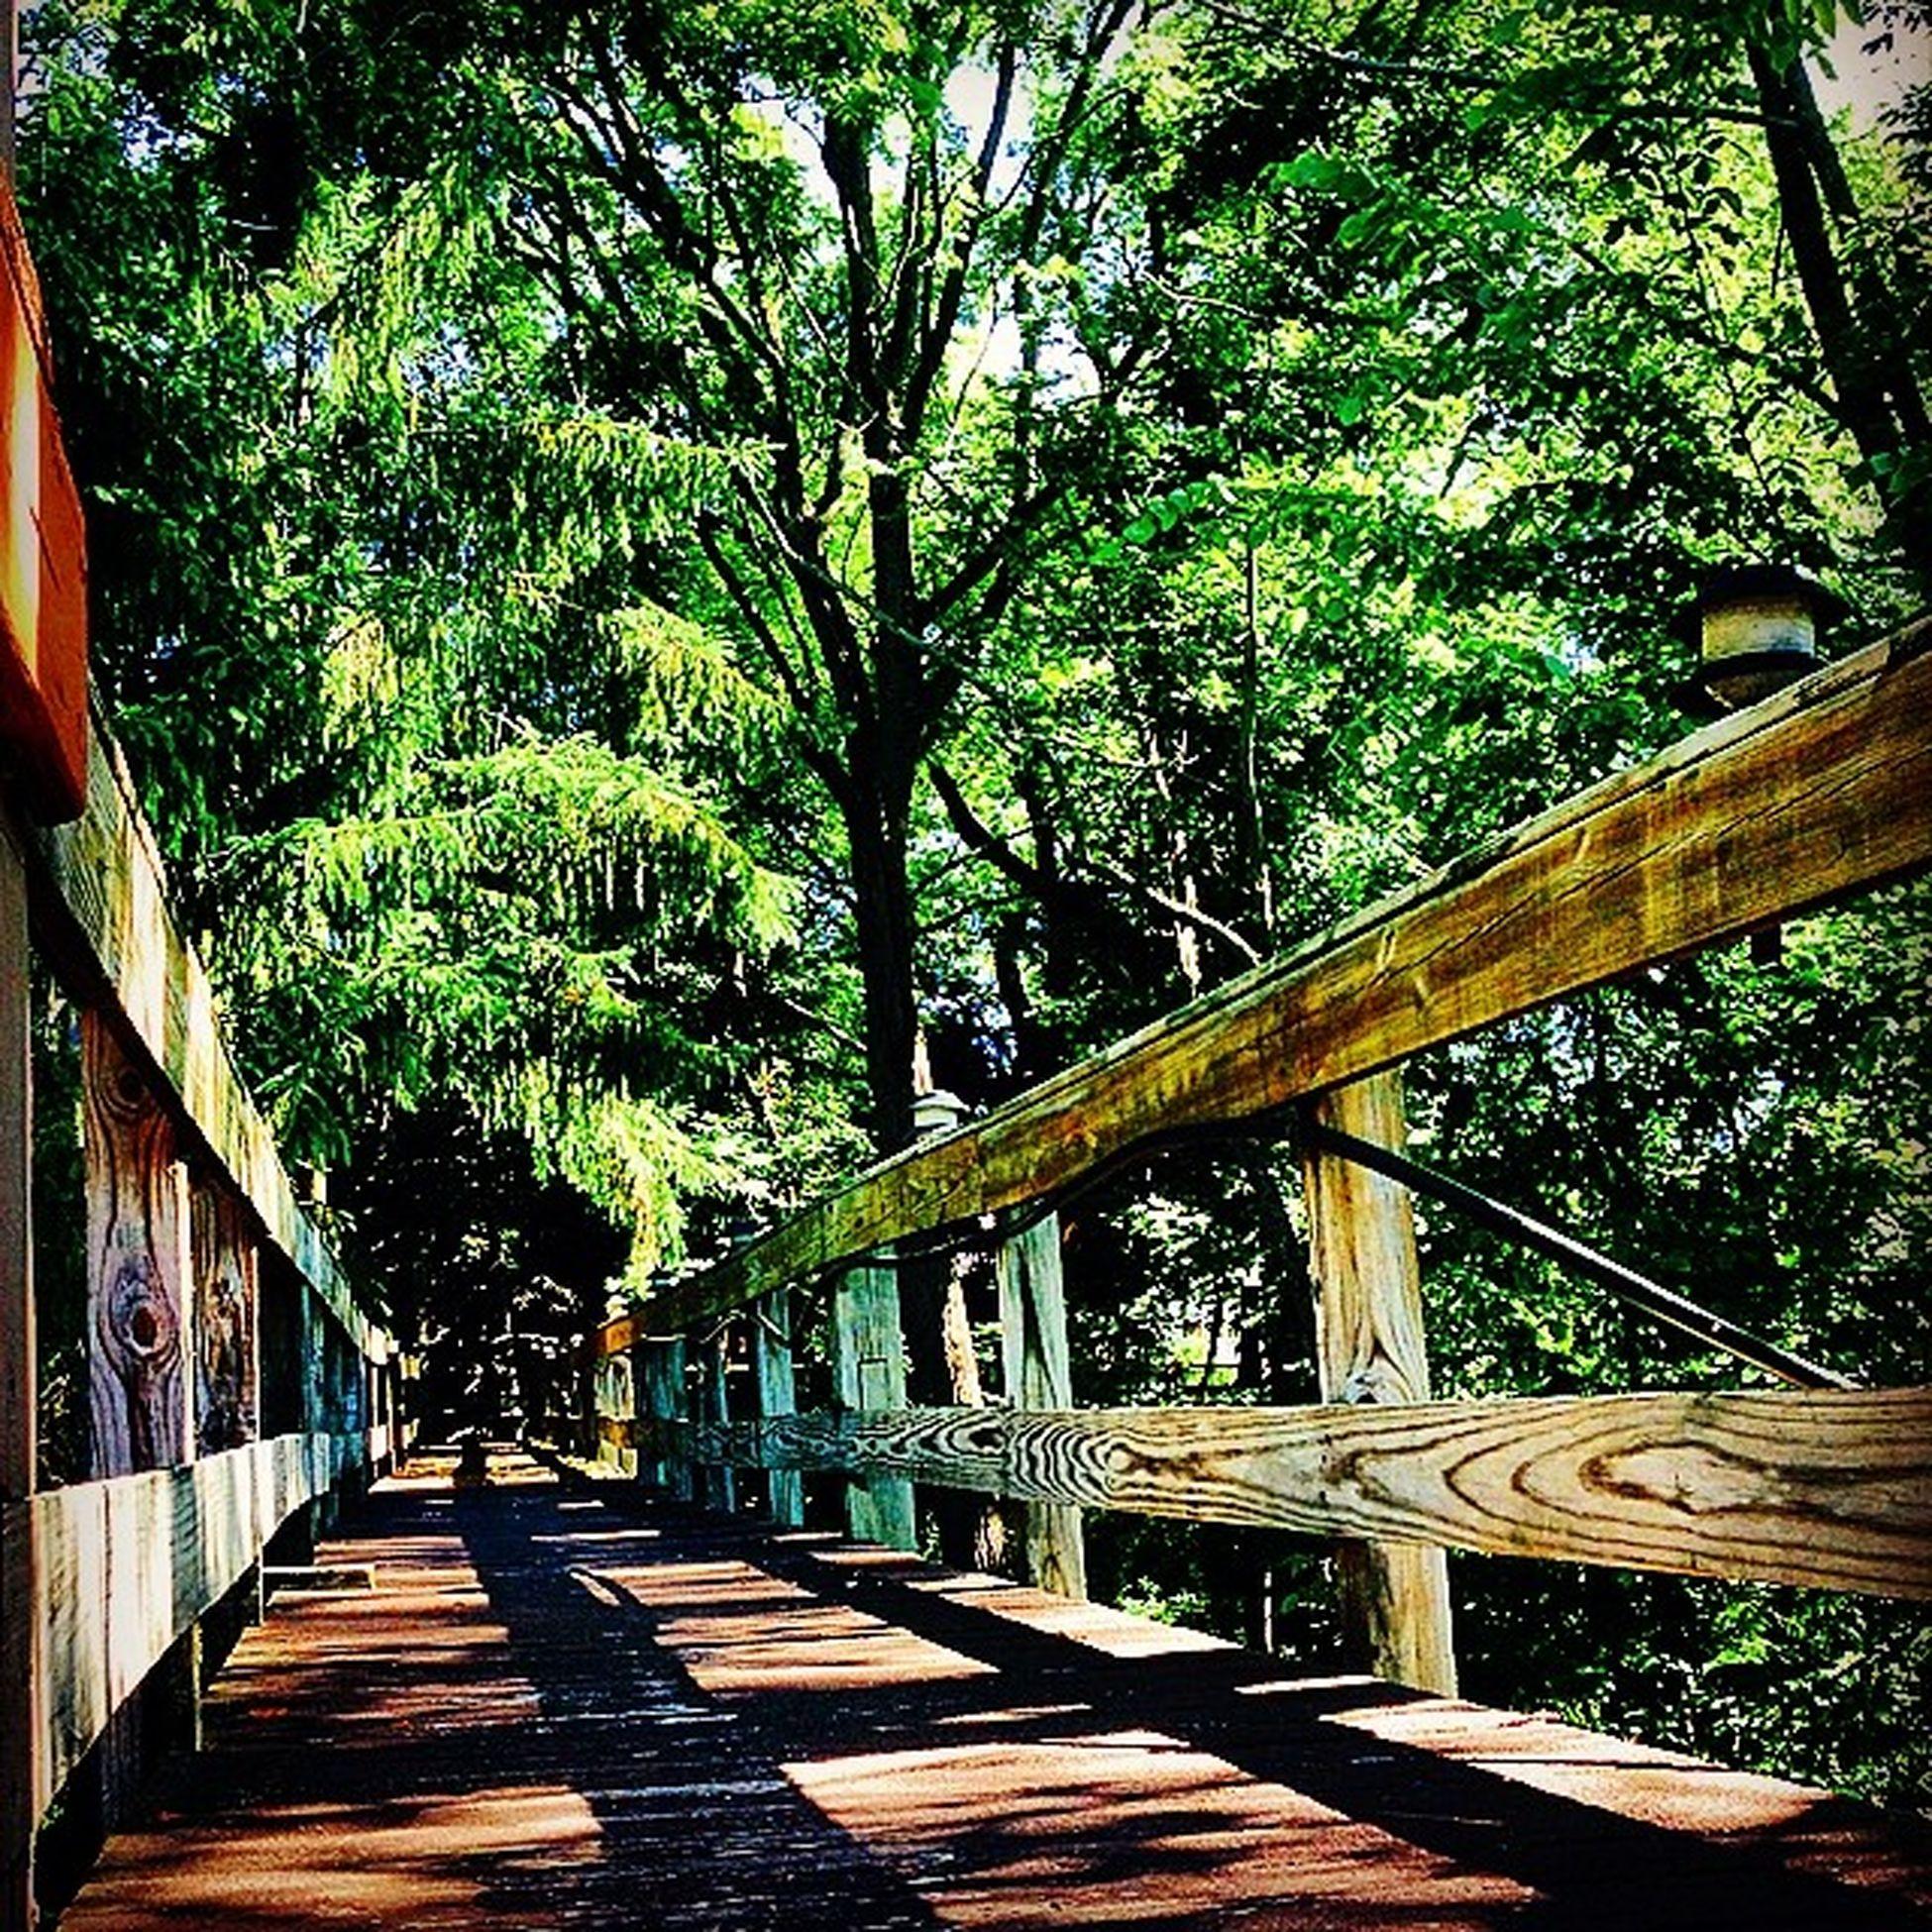 Just a bridge to the jungle Summertime Walkway Scenic 607compound jungle picoftheday architect upstate newyork ny